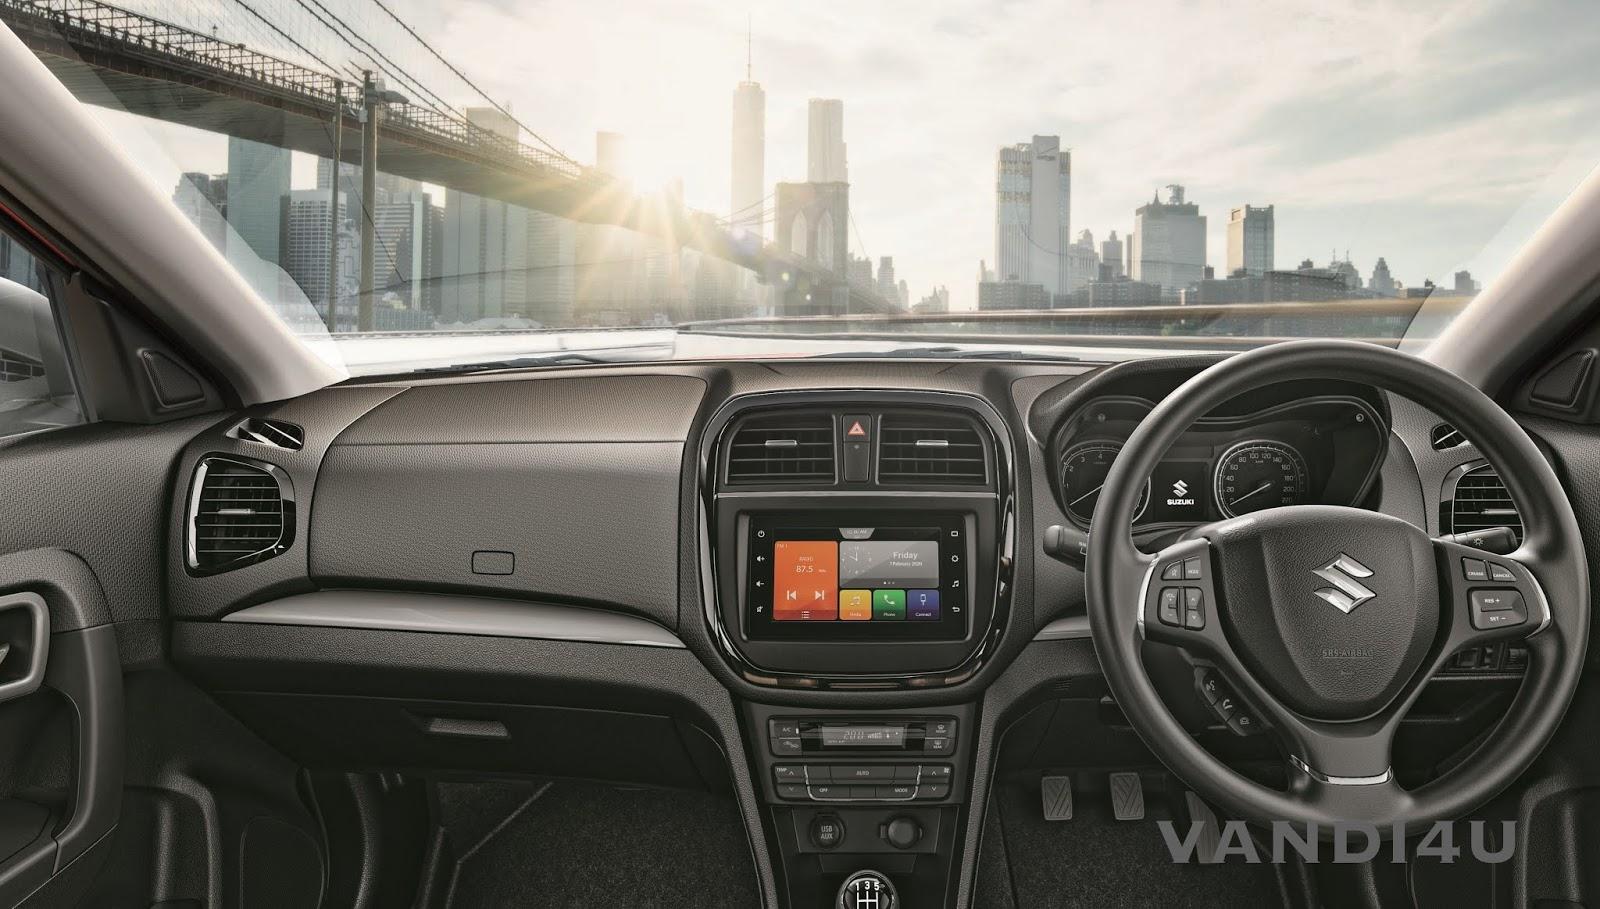 Bookings open for new Maruti Suzuki Vitara Brezza BS6 Petrol | VANDI4U